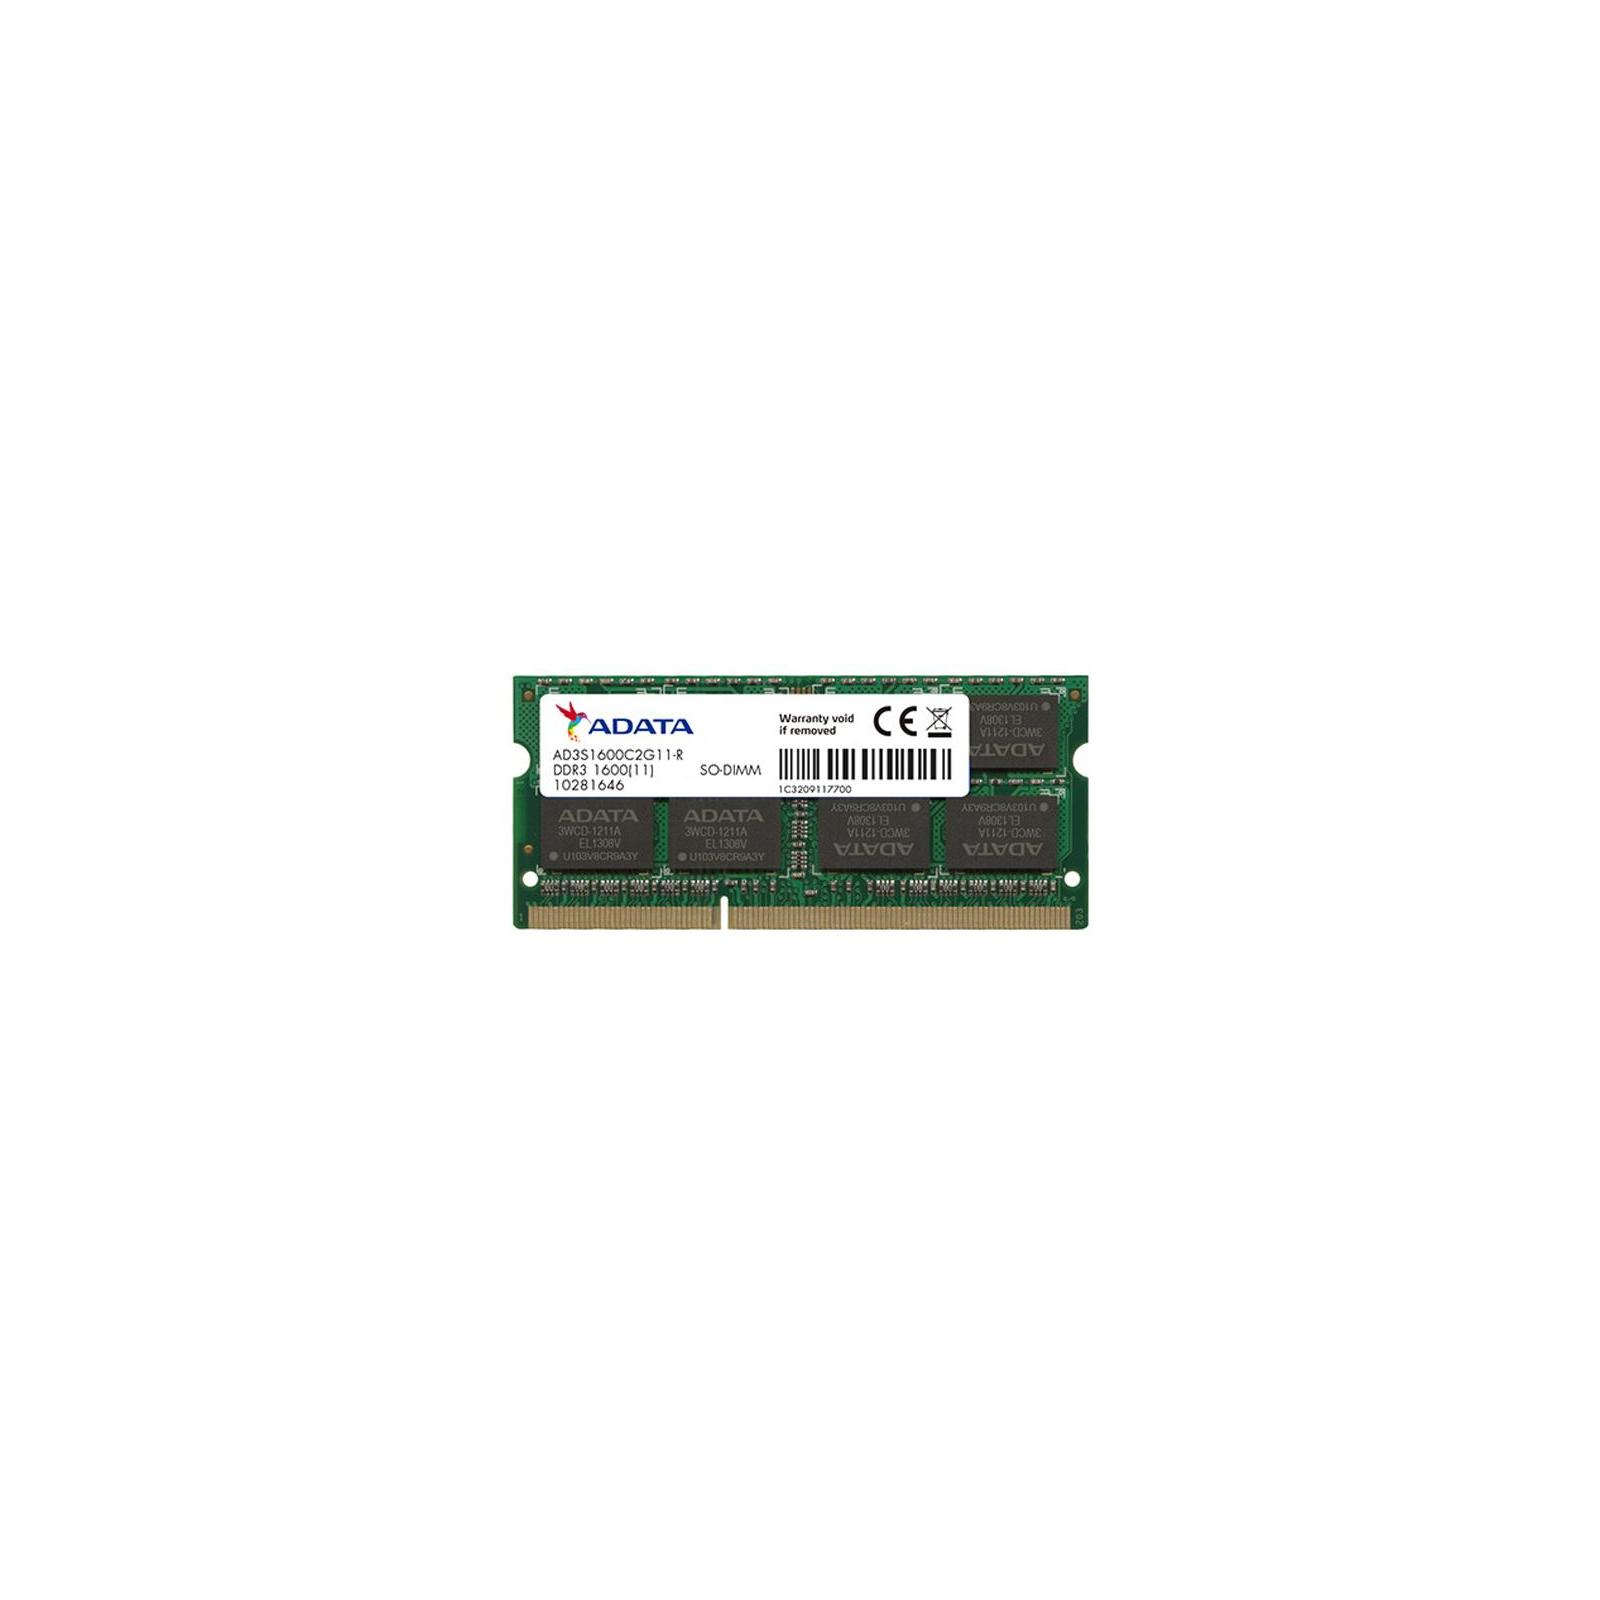 Модуль памяти для ноутбука SoDIMM DDR3 2GB 1600 MHz ADATA (AD3S1600C2G11-S)